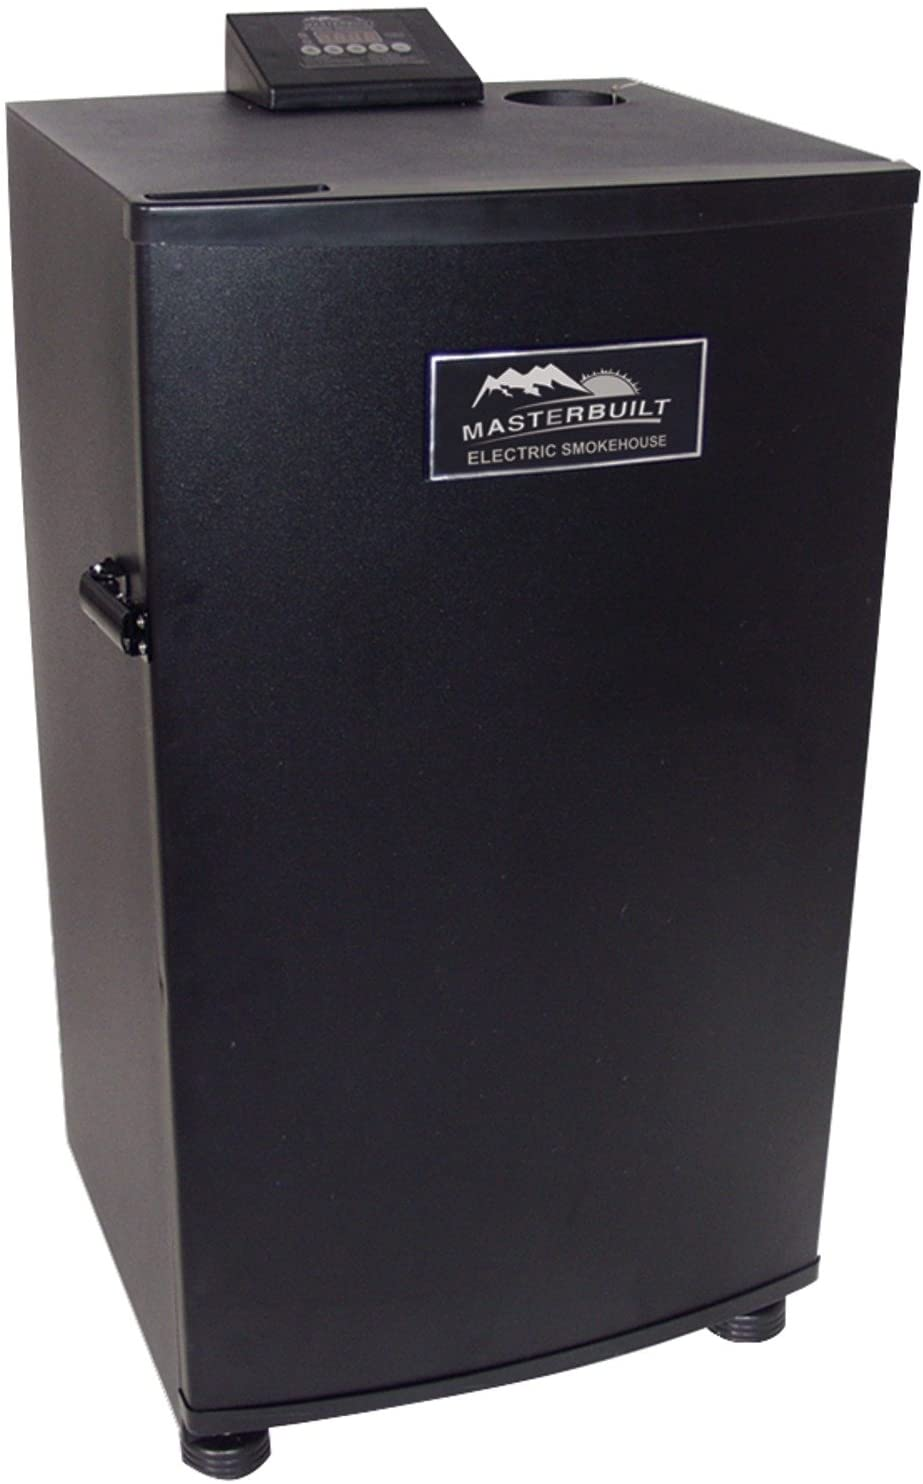 Masterbuilt 20070910 Electric Digital Smoker